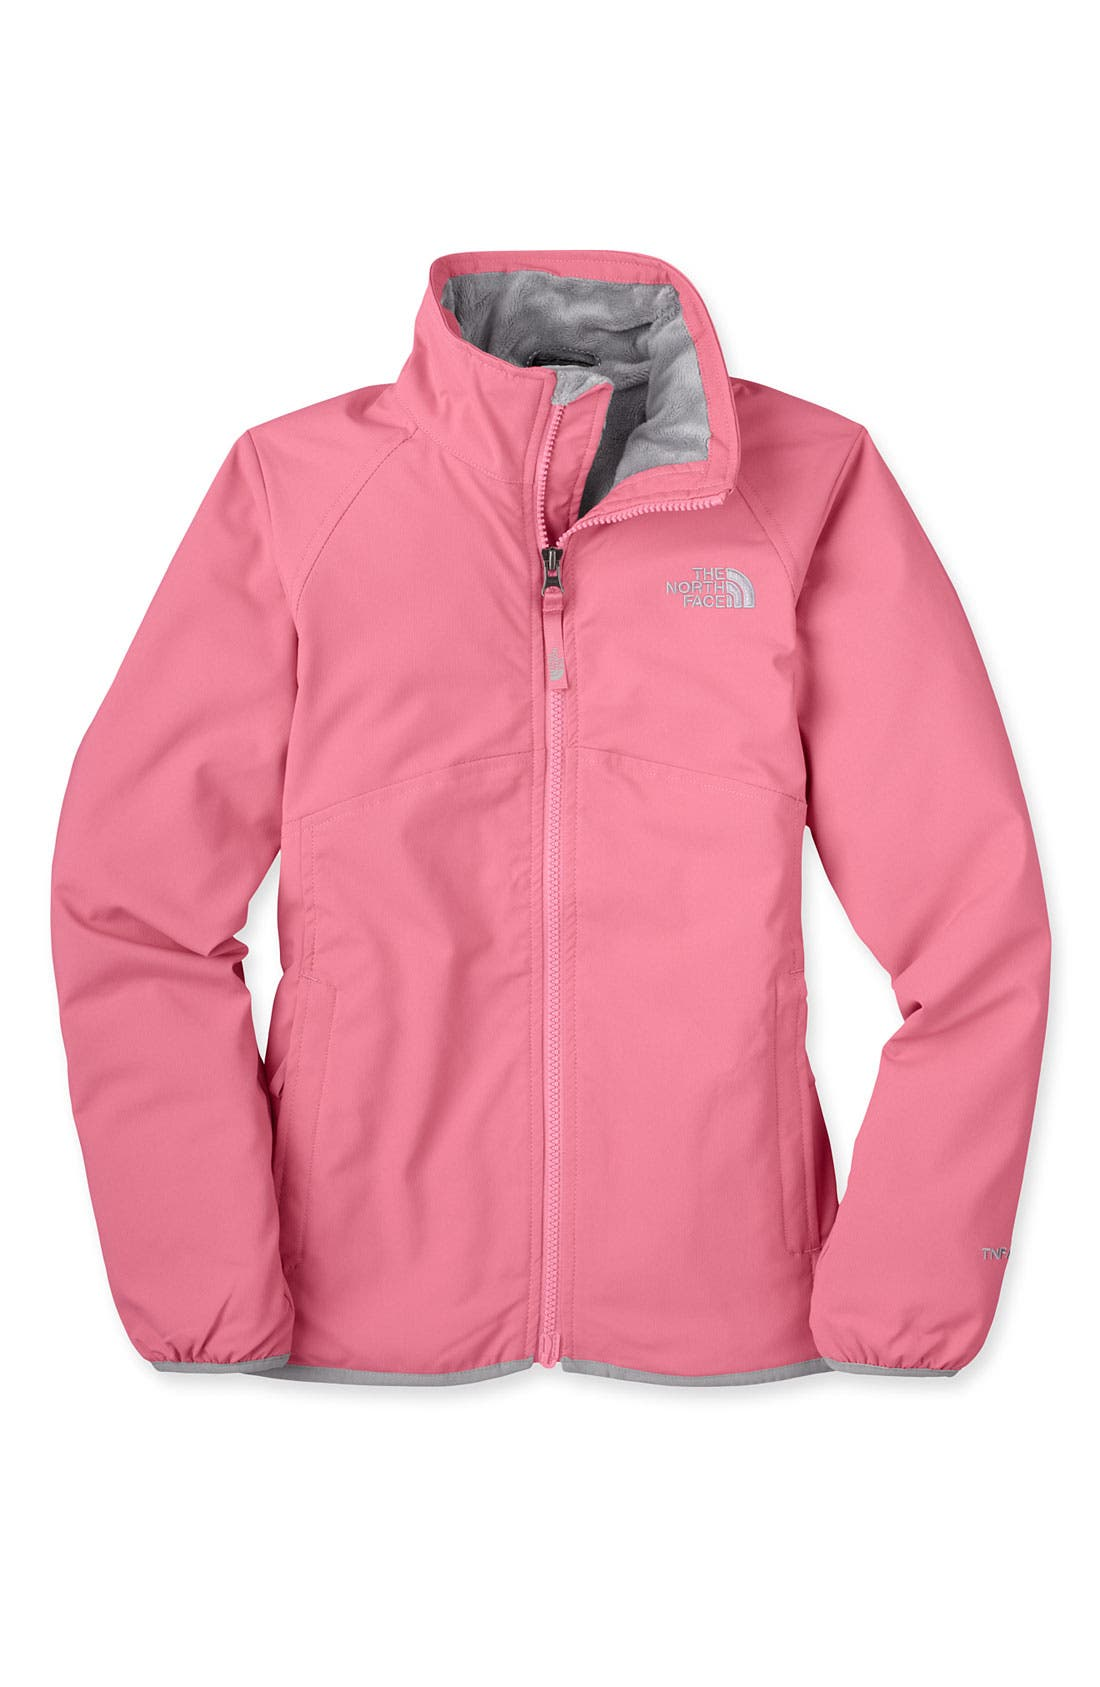 Alternate Image 1 Selected - The North Face 'Mossbud' Softshell Lightweight Jacket (Little Girls & Big Girls)